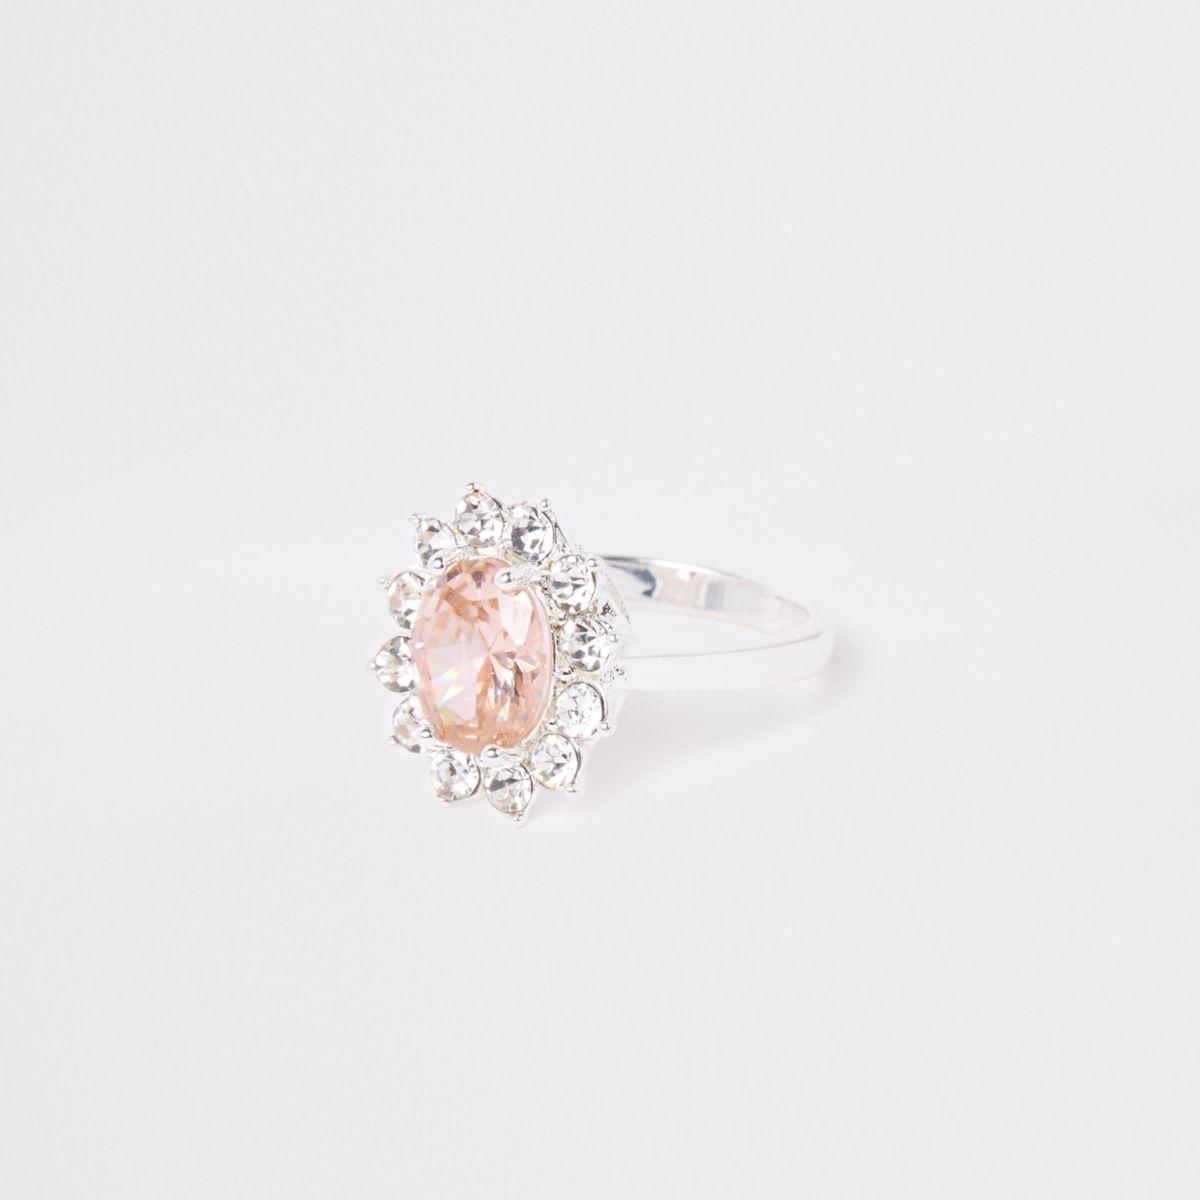 White cubic zirconia diamante pave ring